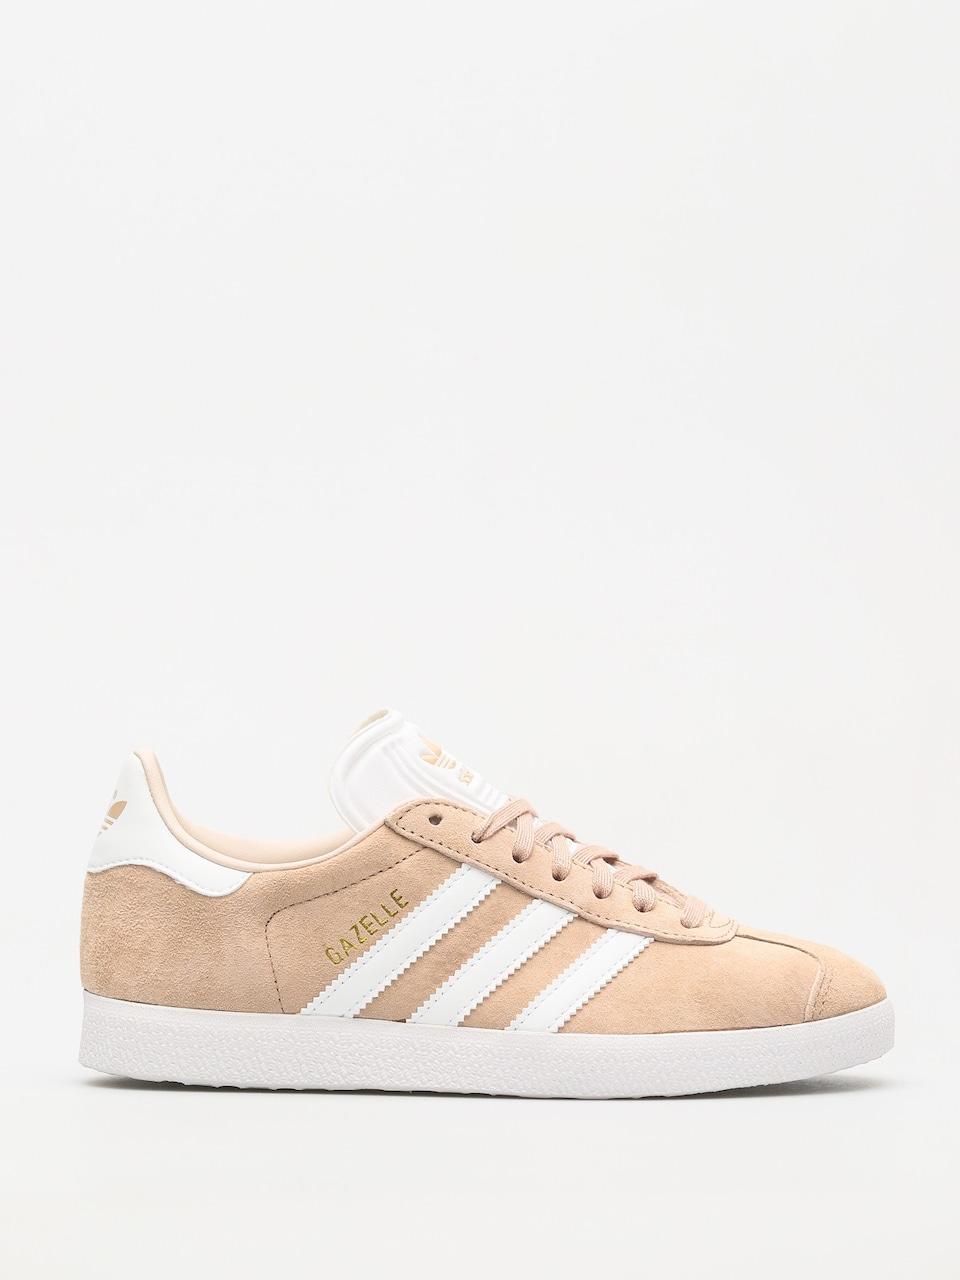 adidas gazelle femme foot locker